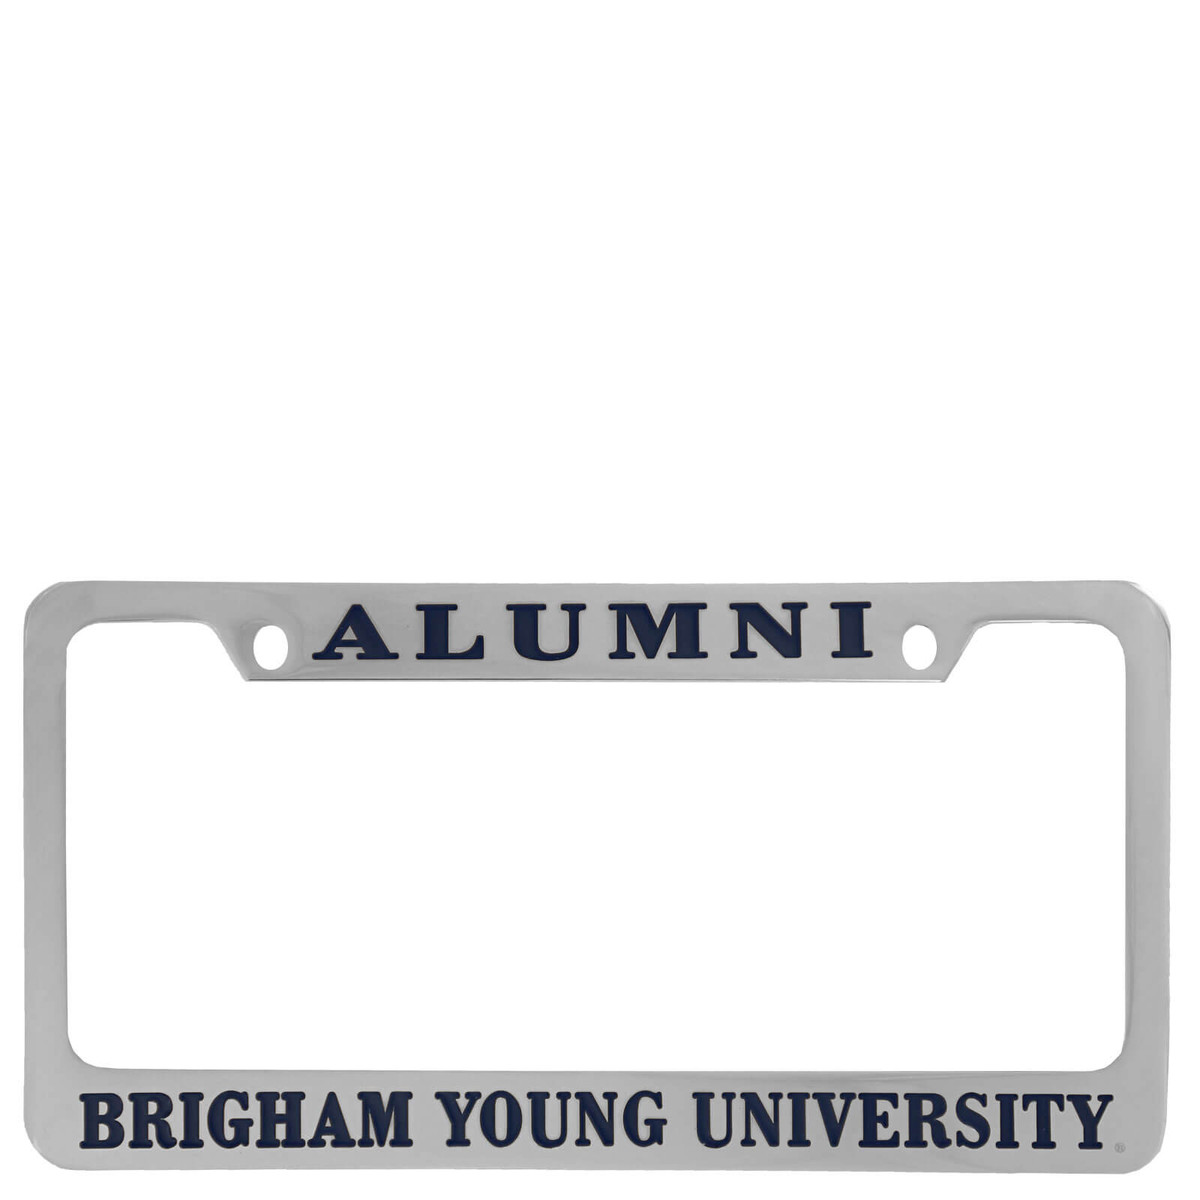 BYU License Plate Frames